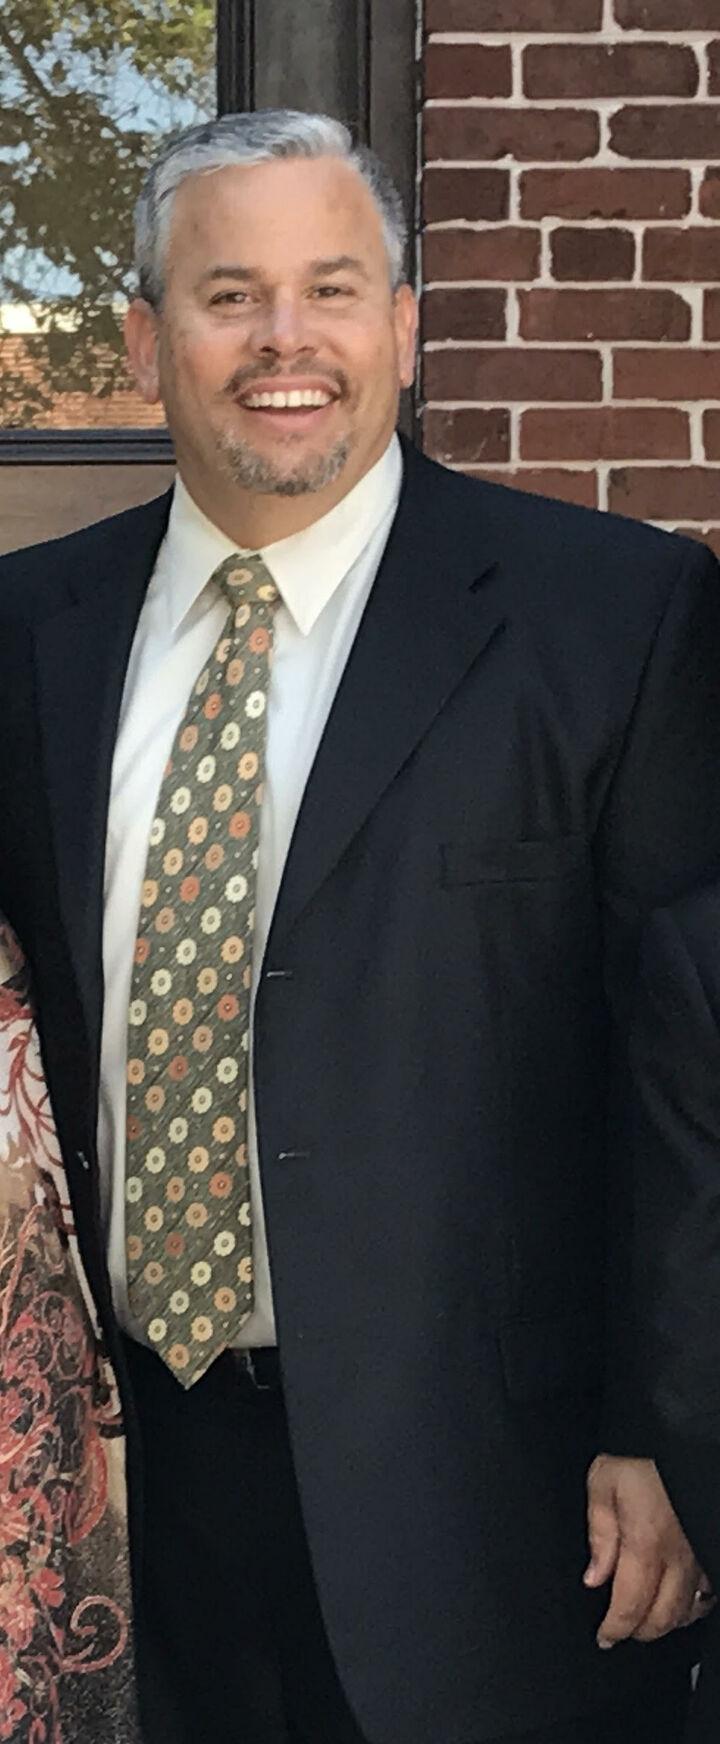 Jose Jordan,  in Lutz, Dennis Realty & Investment Corp.